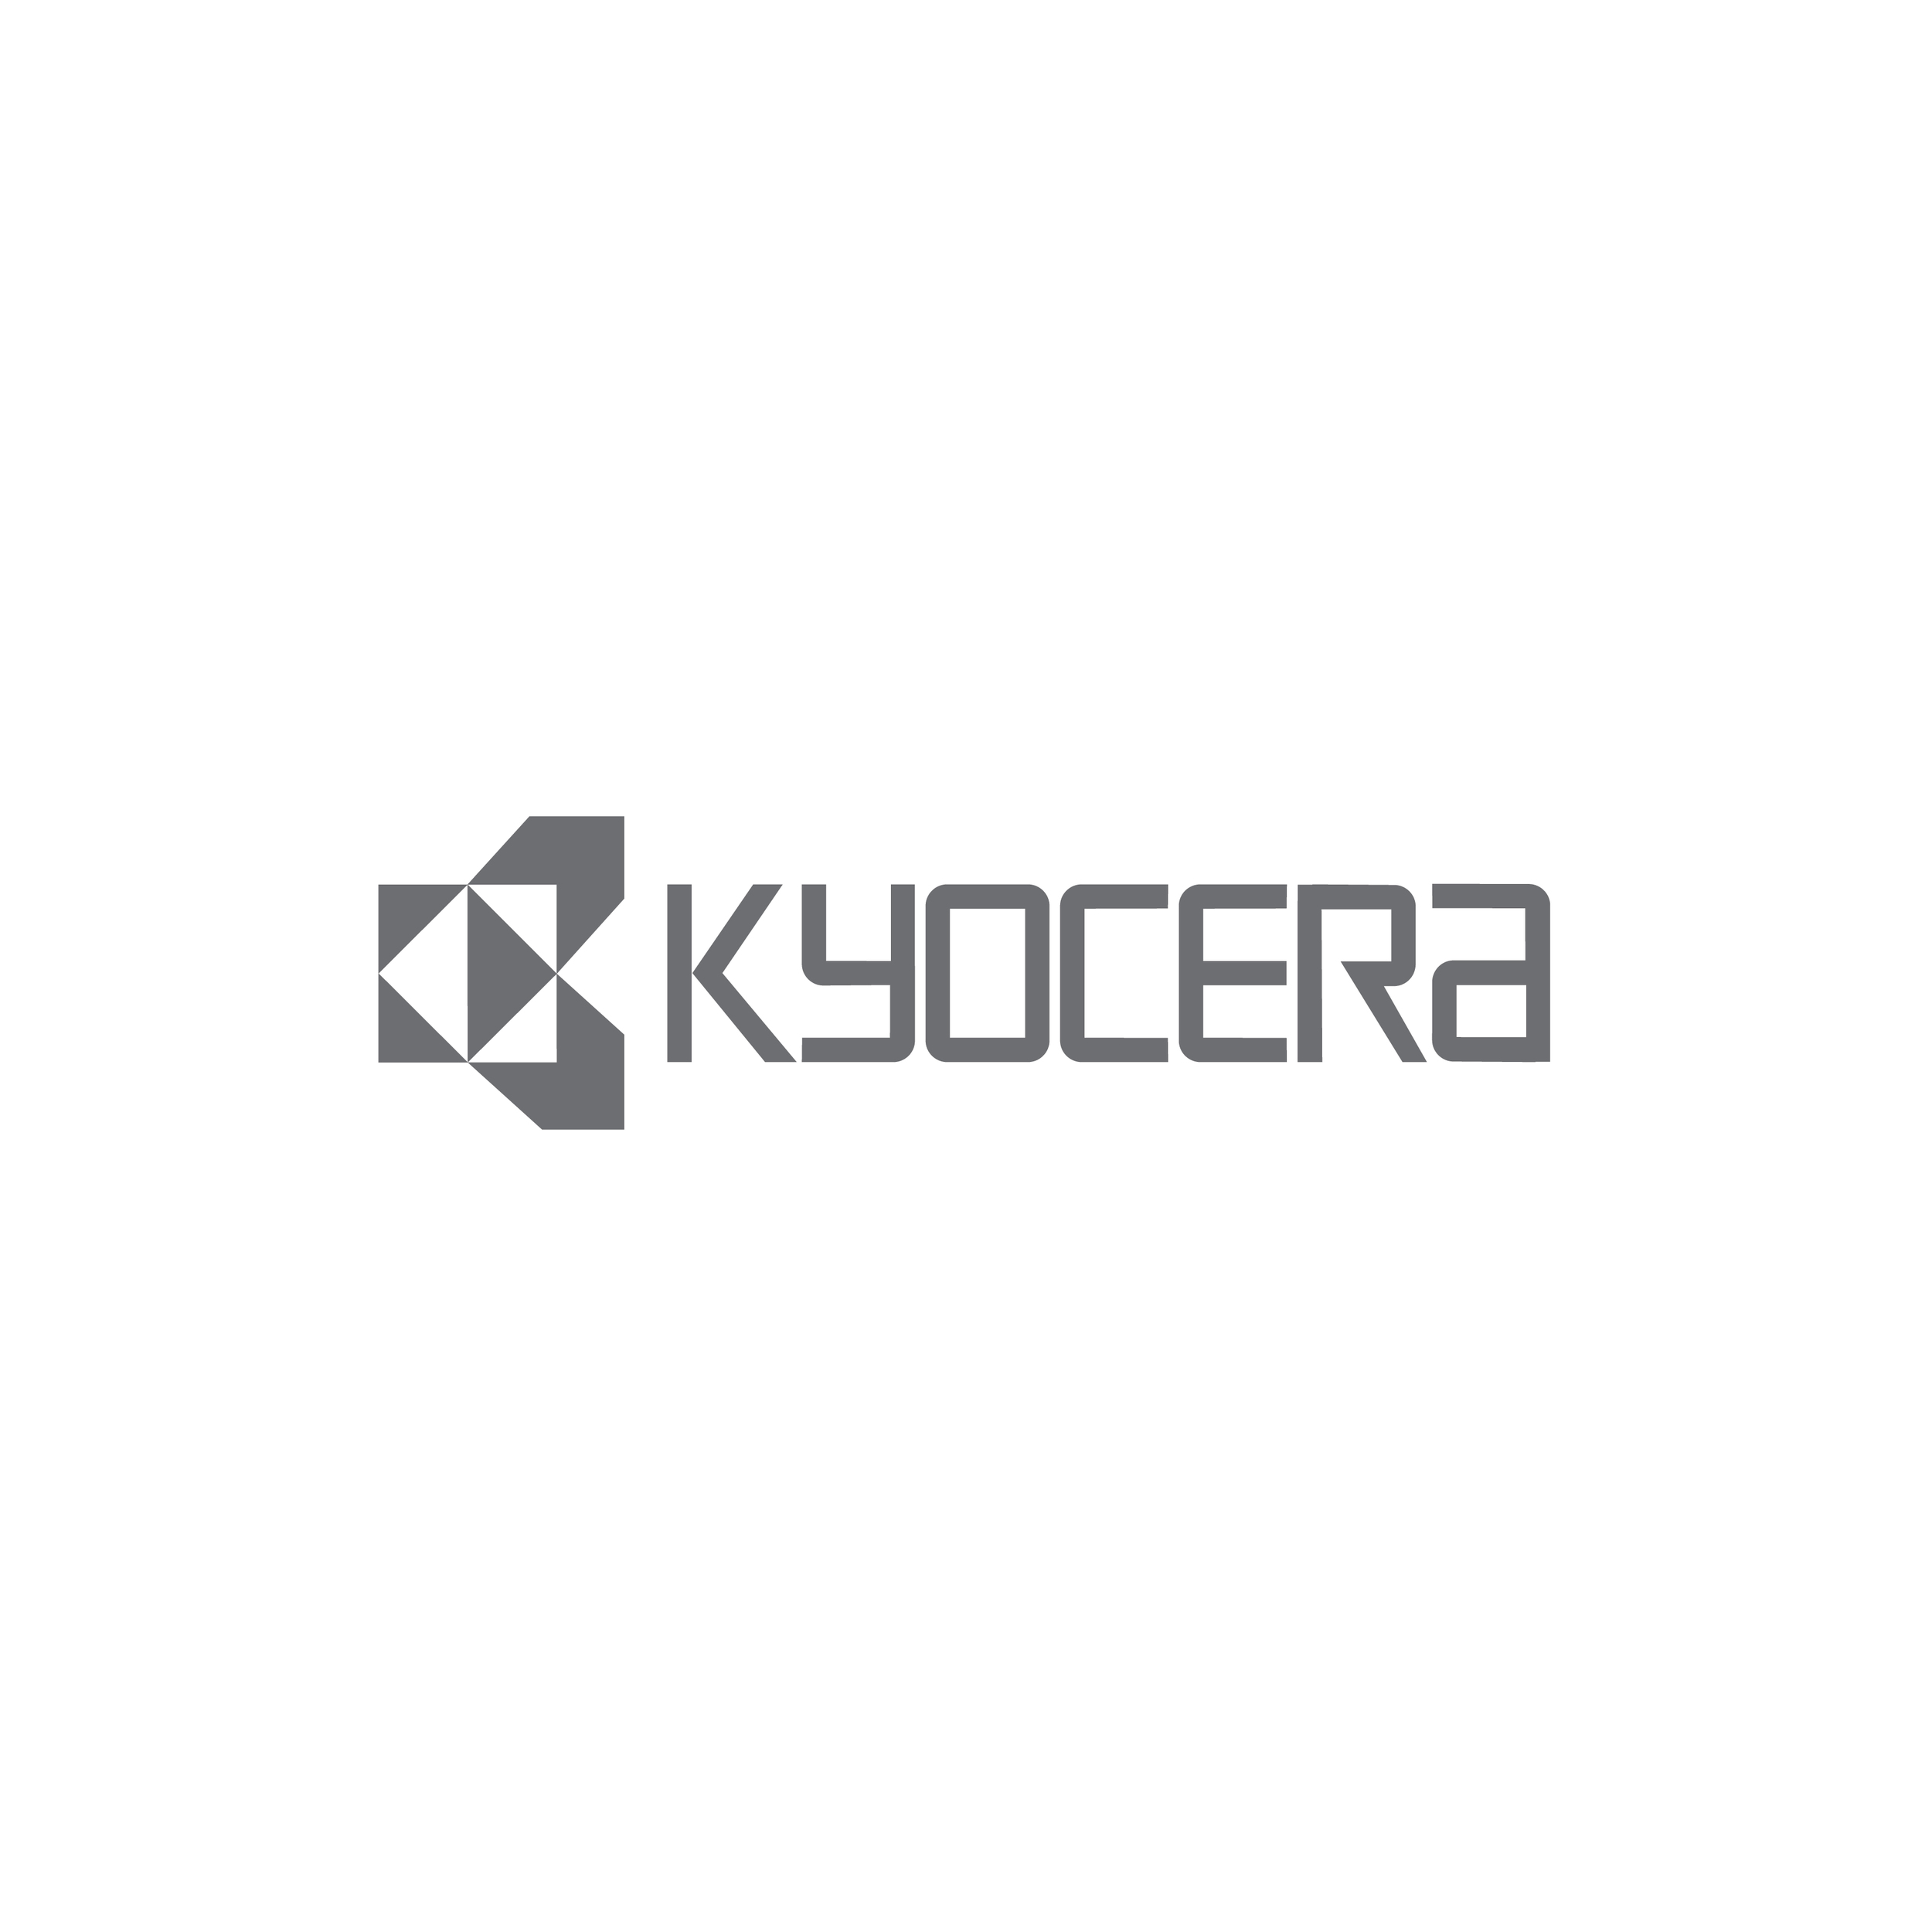 Logo-16-Kyocera.jpg